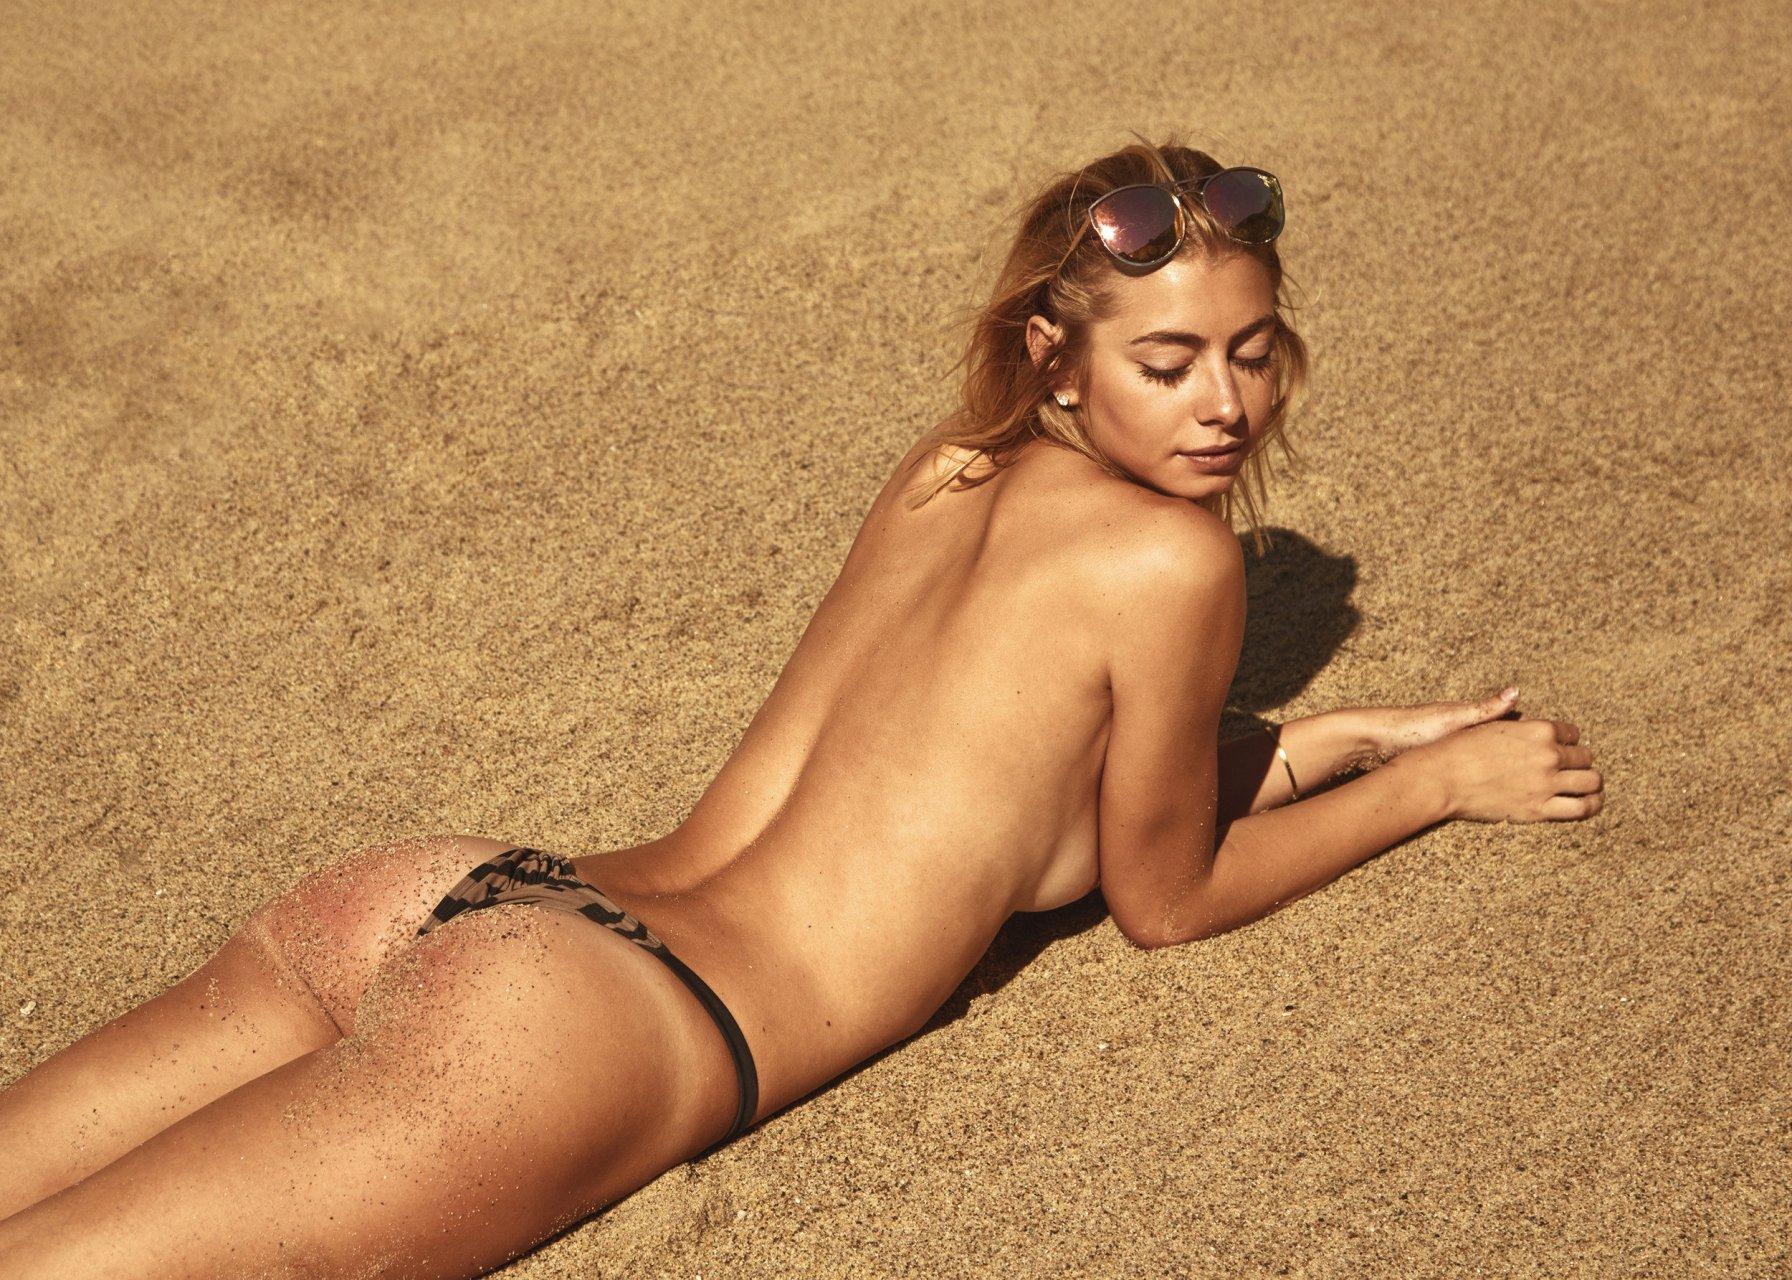 Bikini Pics Of Callie Fenoglio Nude Photos